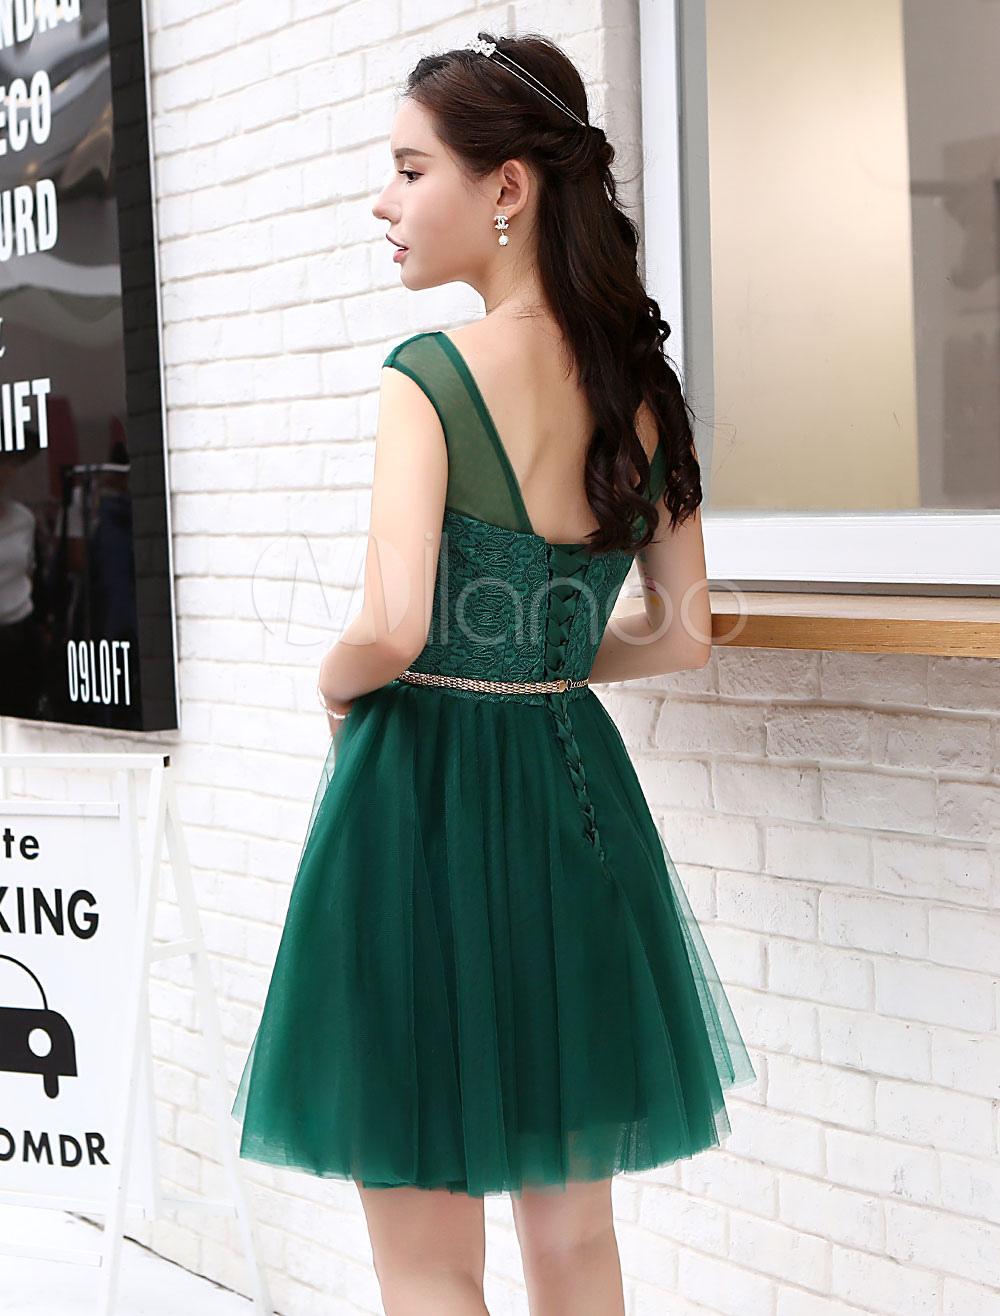 dcca6ed478 ... Short Homecoming Dresses Tulle Dark Green Illusion Sash Mini Cocktail  Dresses-No.5 ...